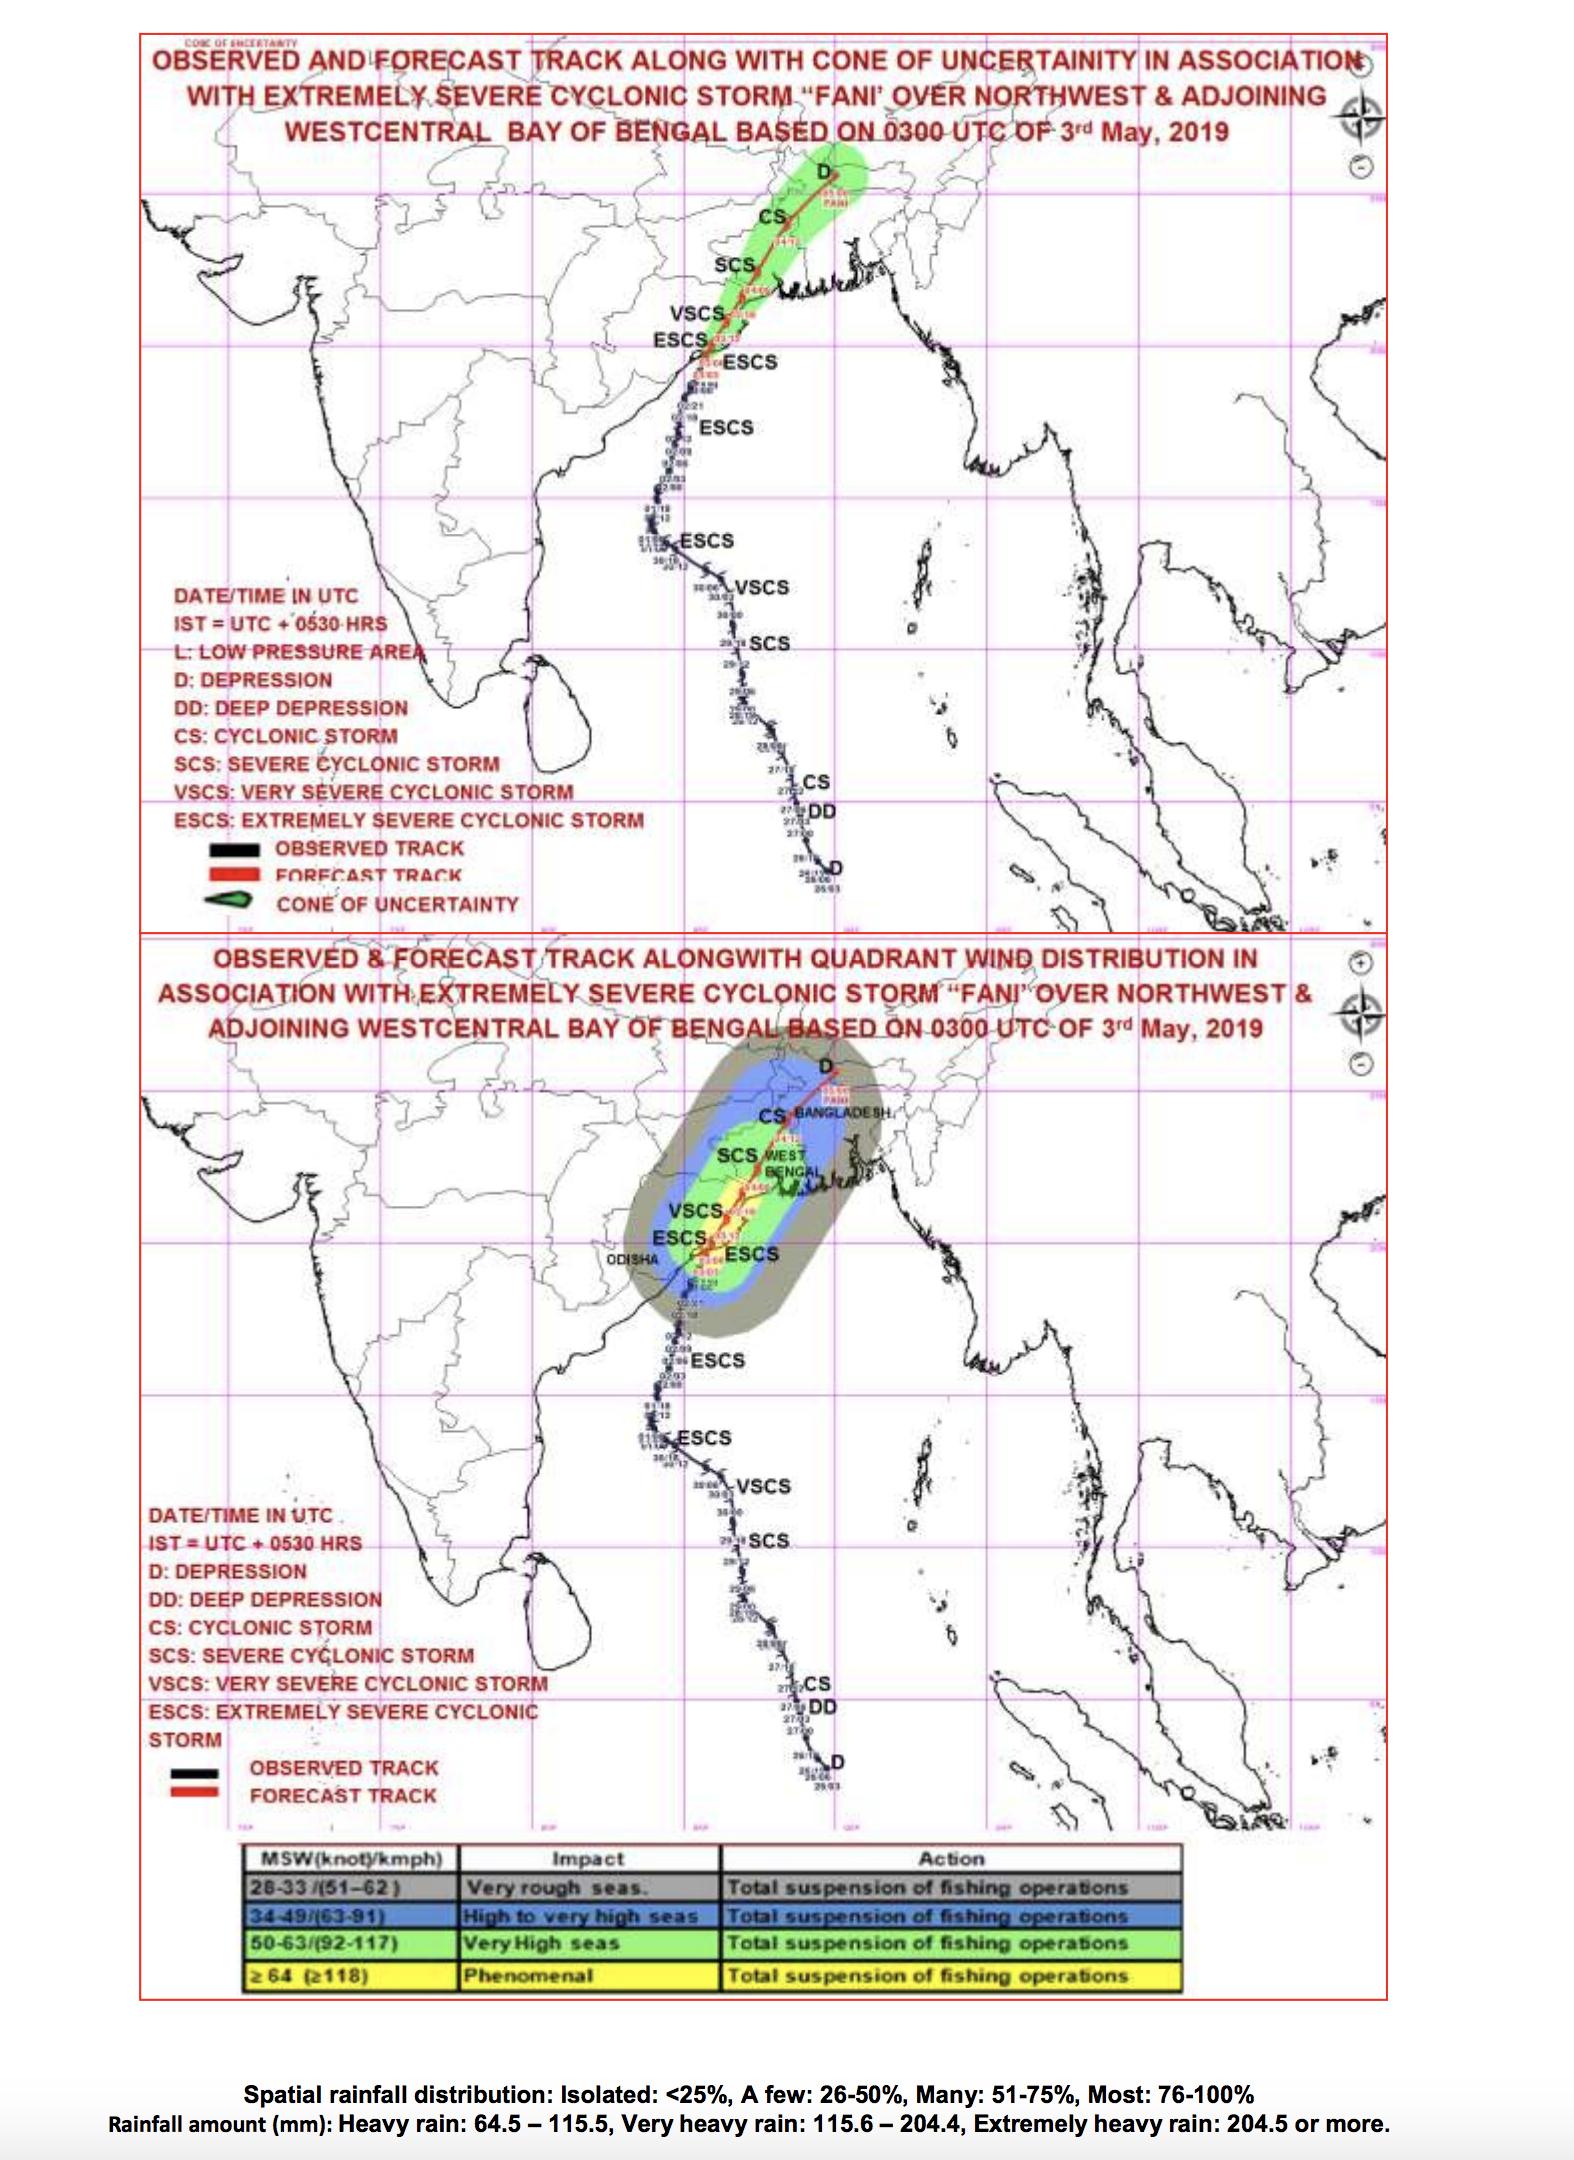 Cyclone Fani hits Indian state of Odisha 3 May